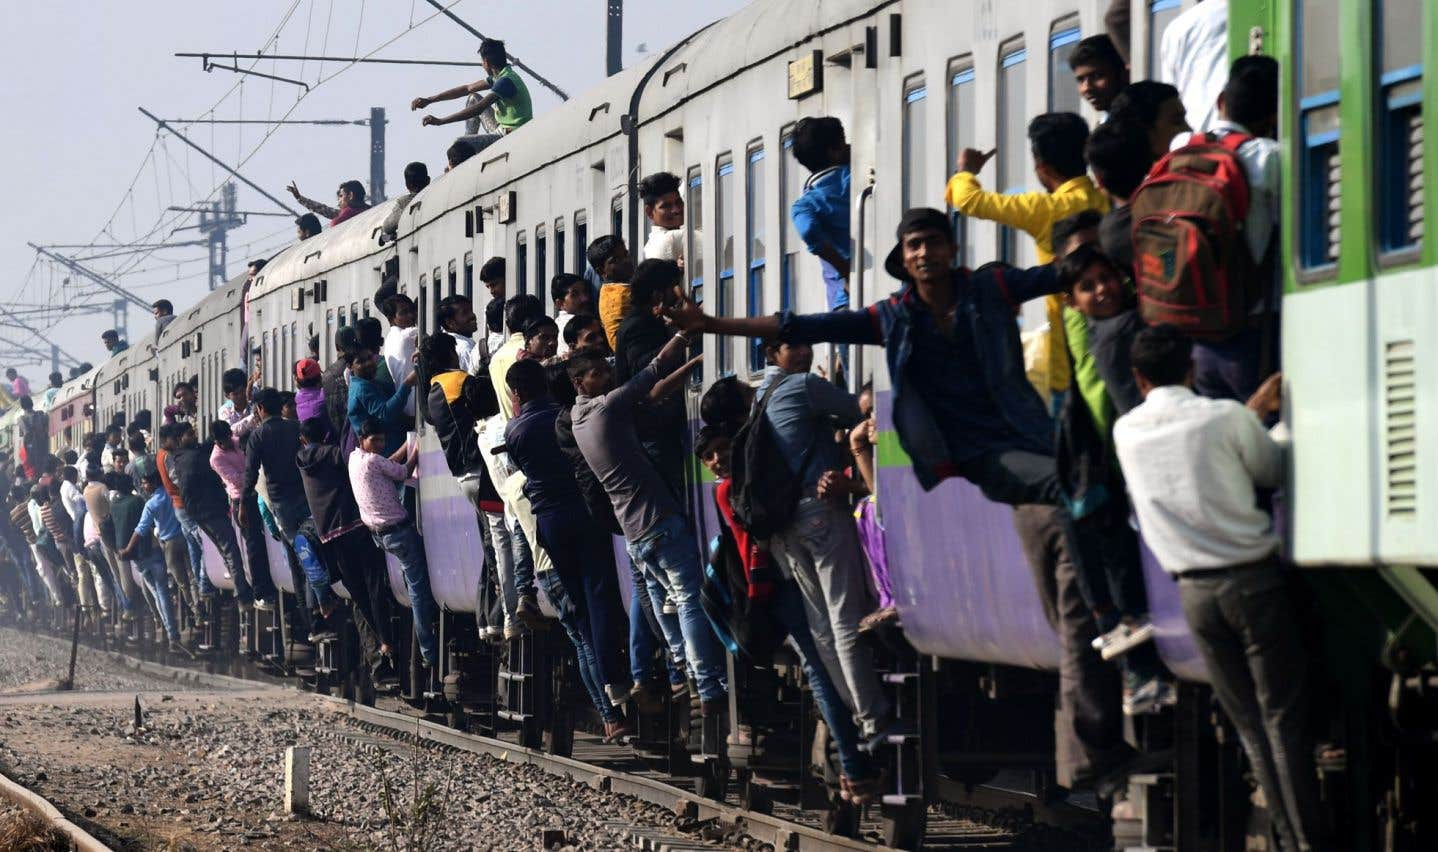 La population mondiale atteindra 9,8milliards d'habitants en 2050